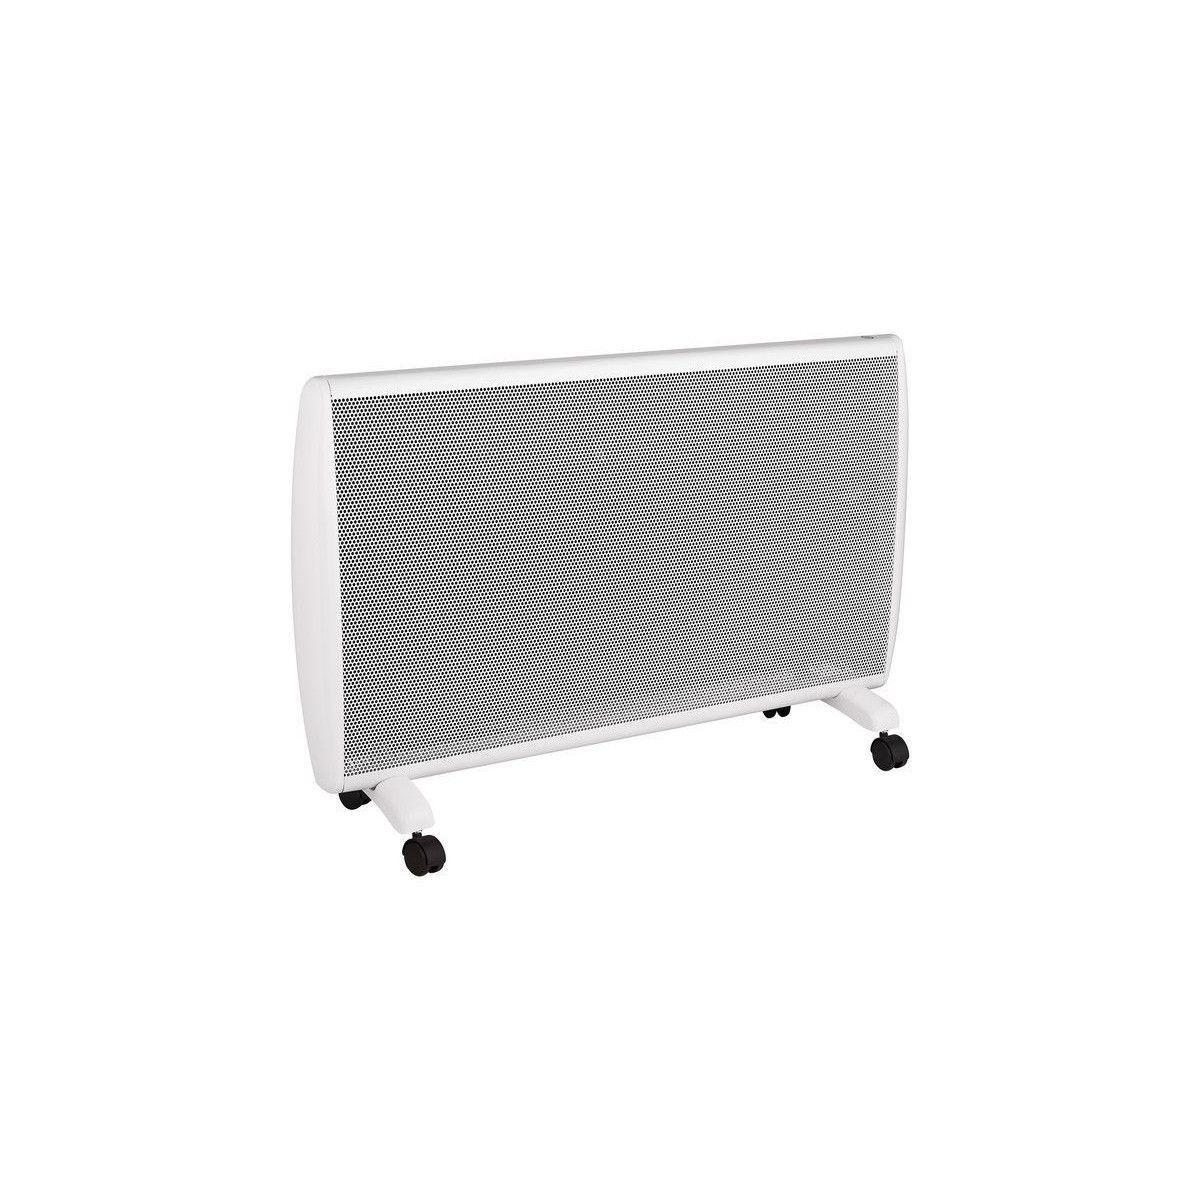 Haverland Panneau Rayonnant Mobile Haverland Anubis-15 1500 W (blanc)